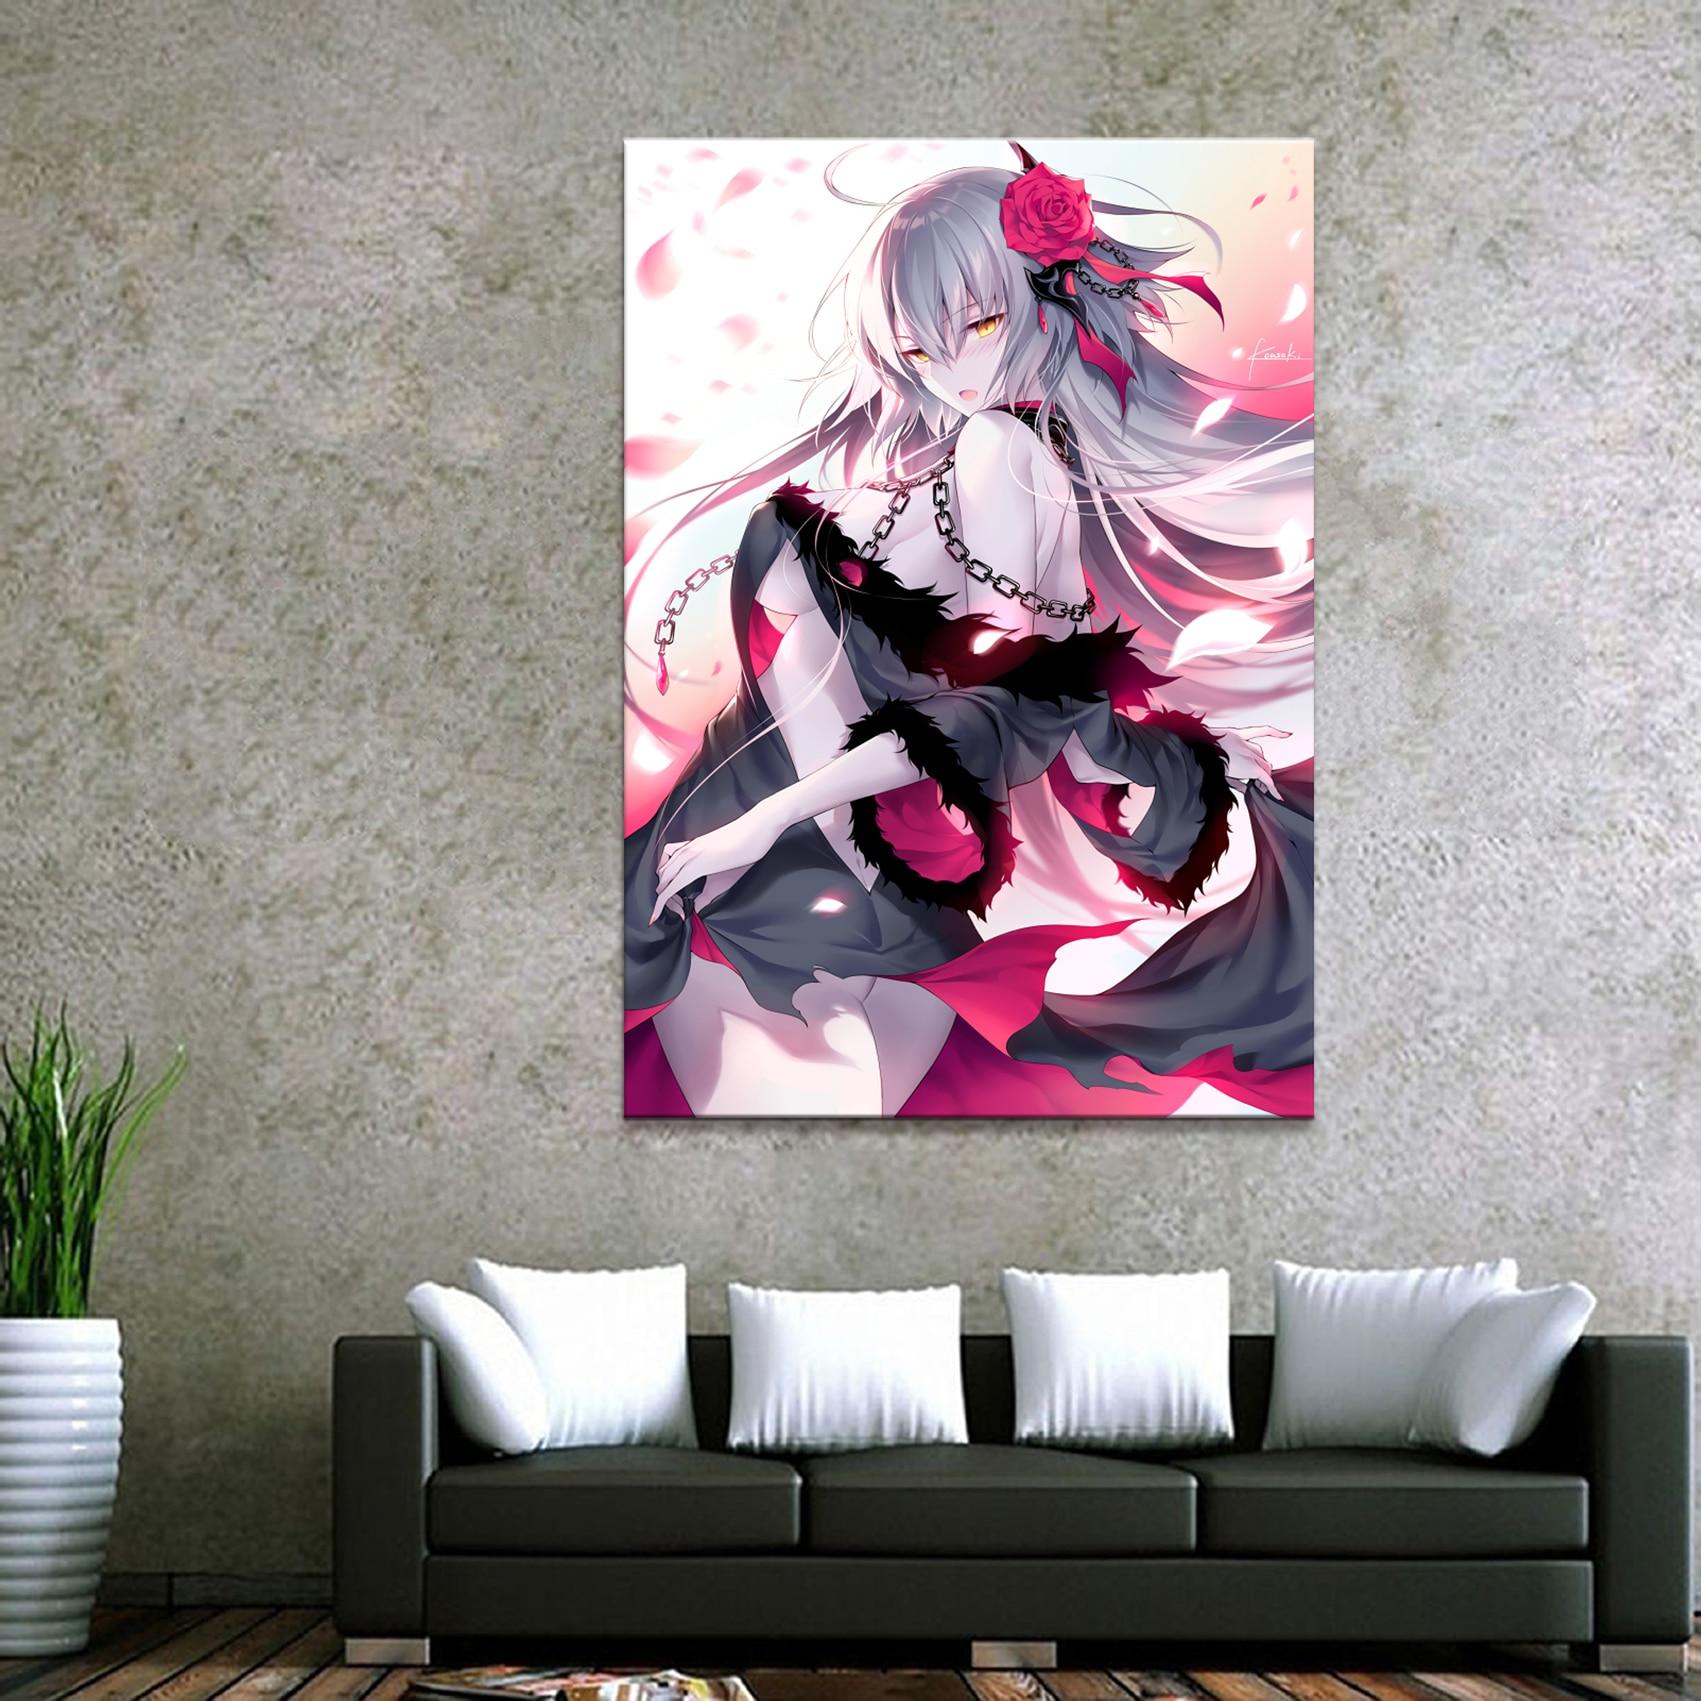 Bonitos Anime Fate Grand Order, imagen de diamante bordado, decoración para el hogar, pintura, taladro redondo completo, regalo de punto de Cruz, pared hecha a mano